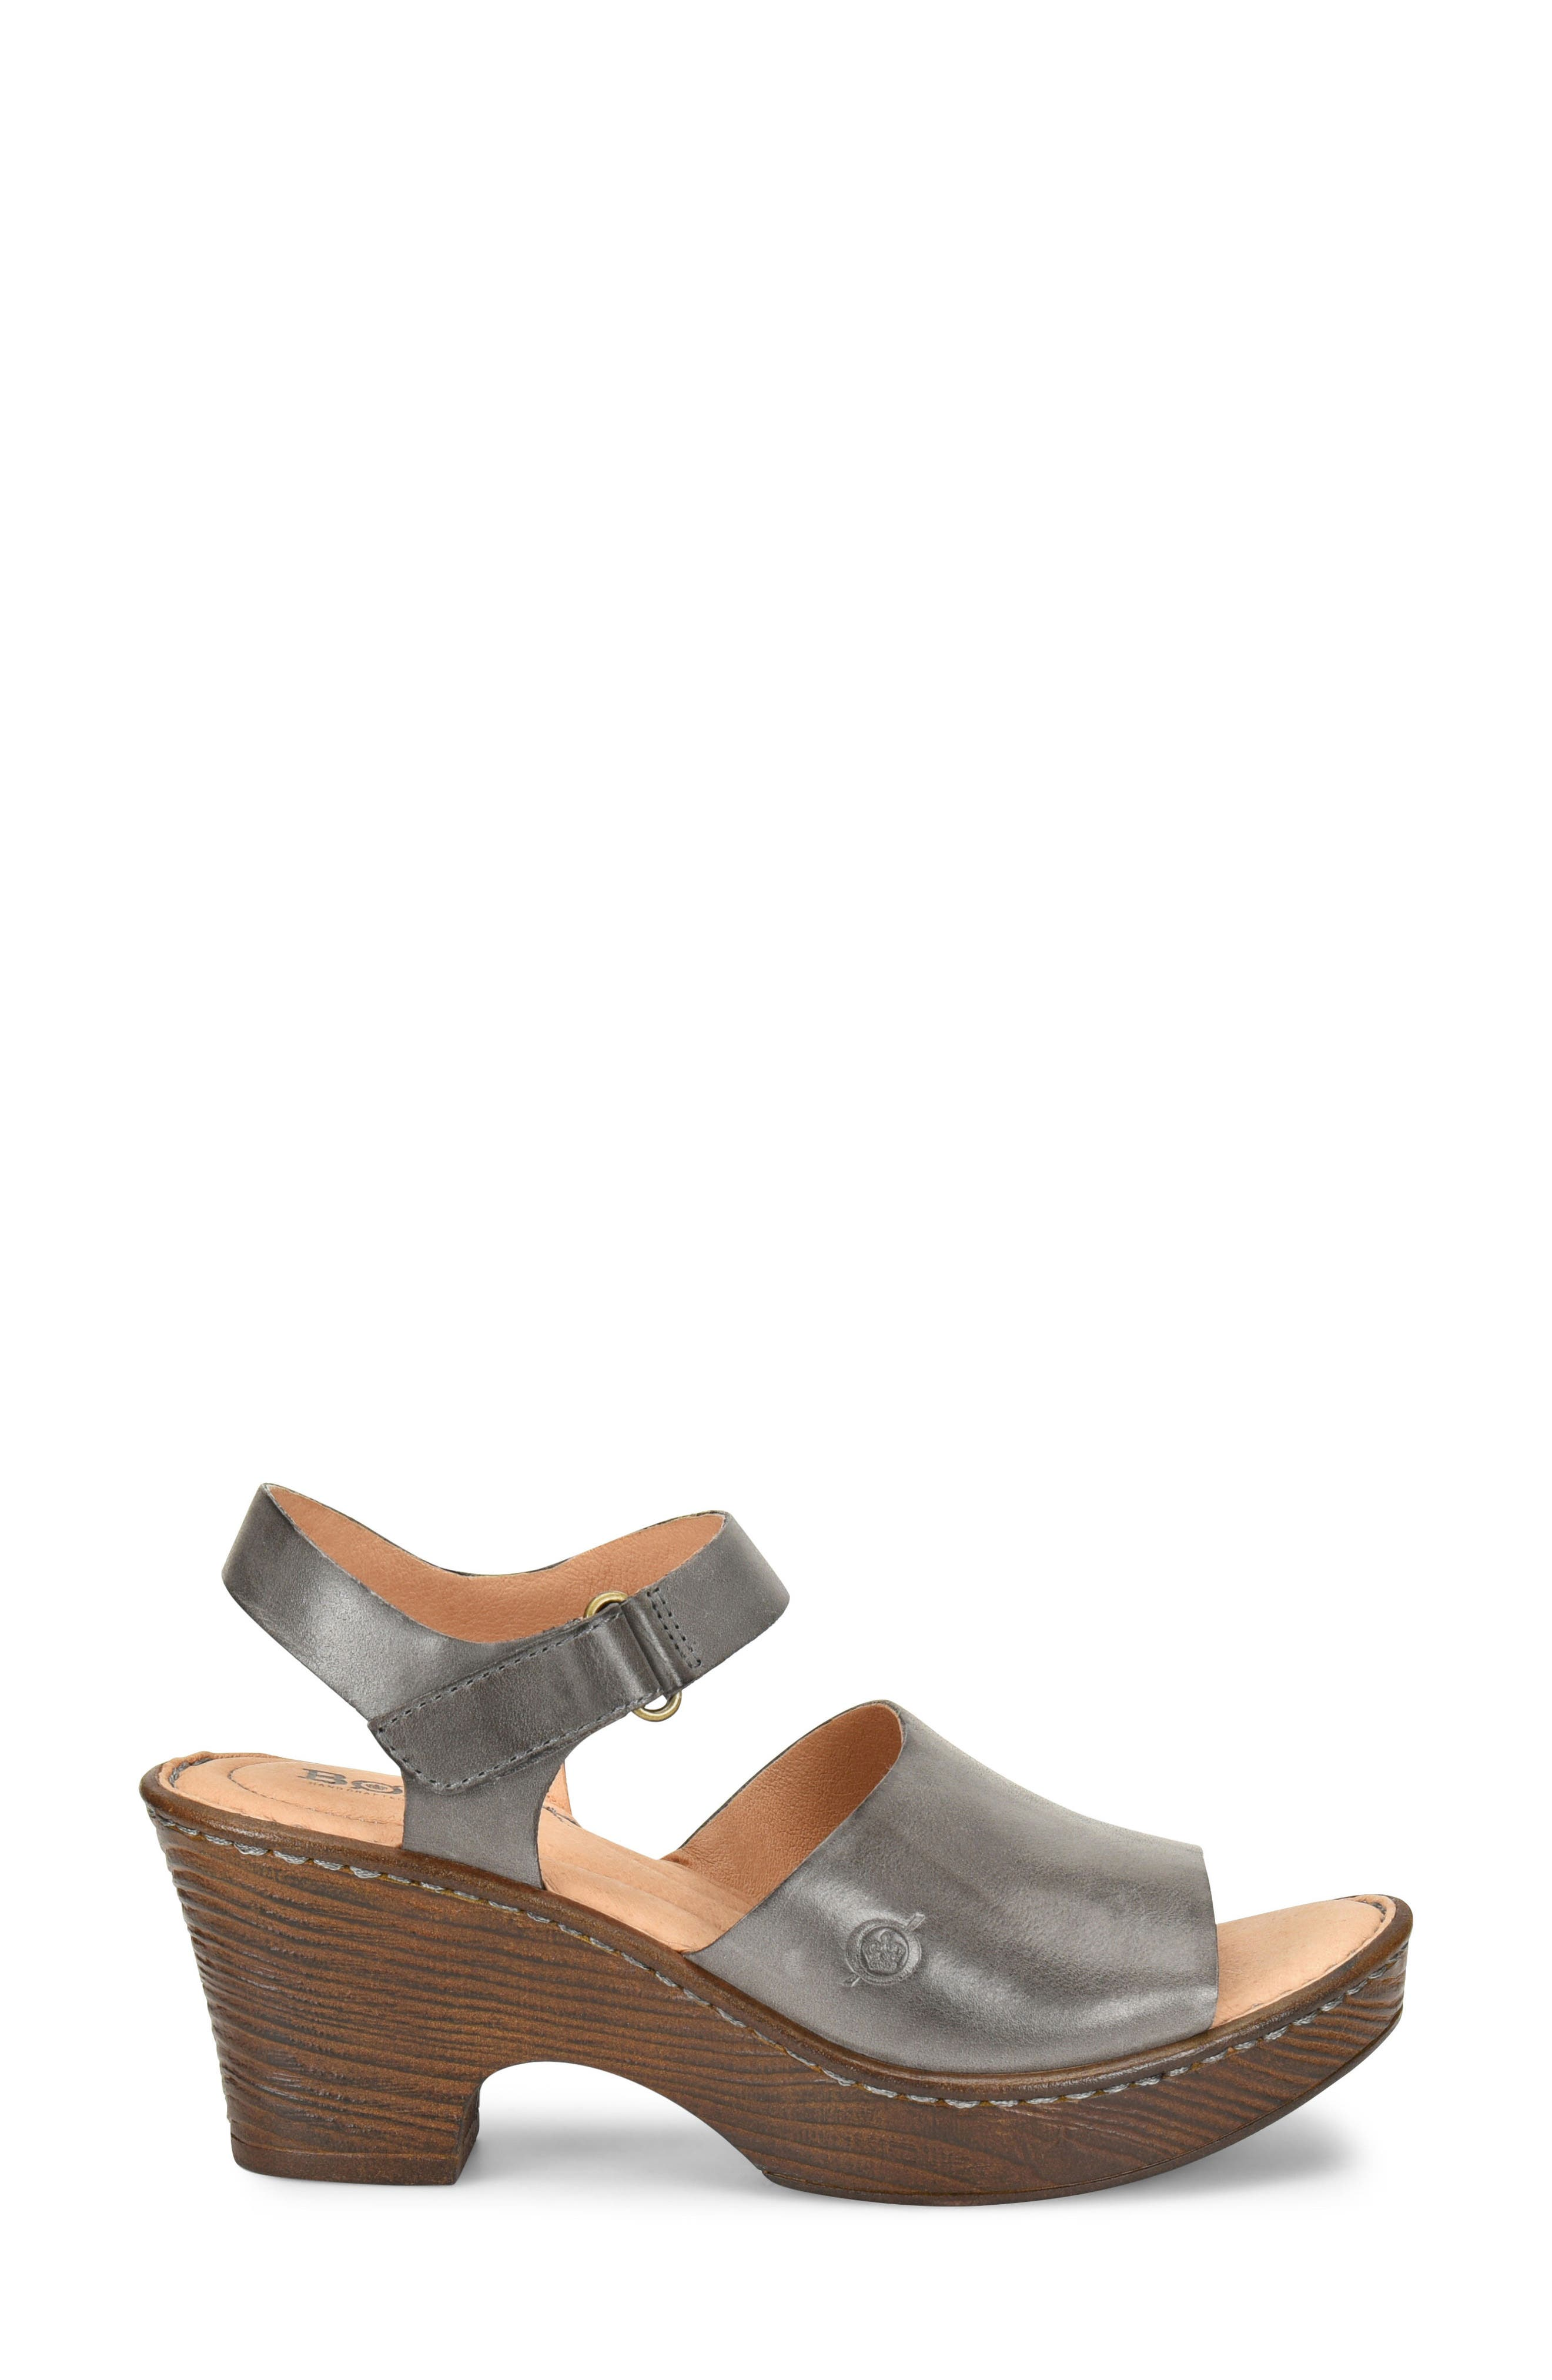 Canna Platform Sandal,                             Alternate thumbnail 3, color,                             Grey Leather